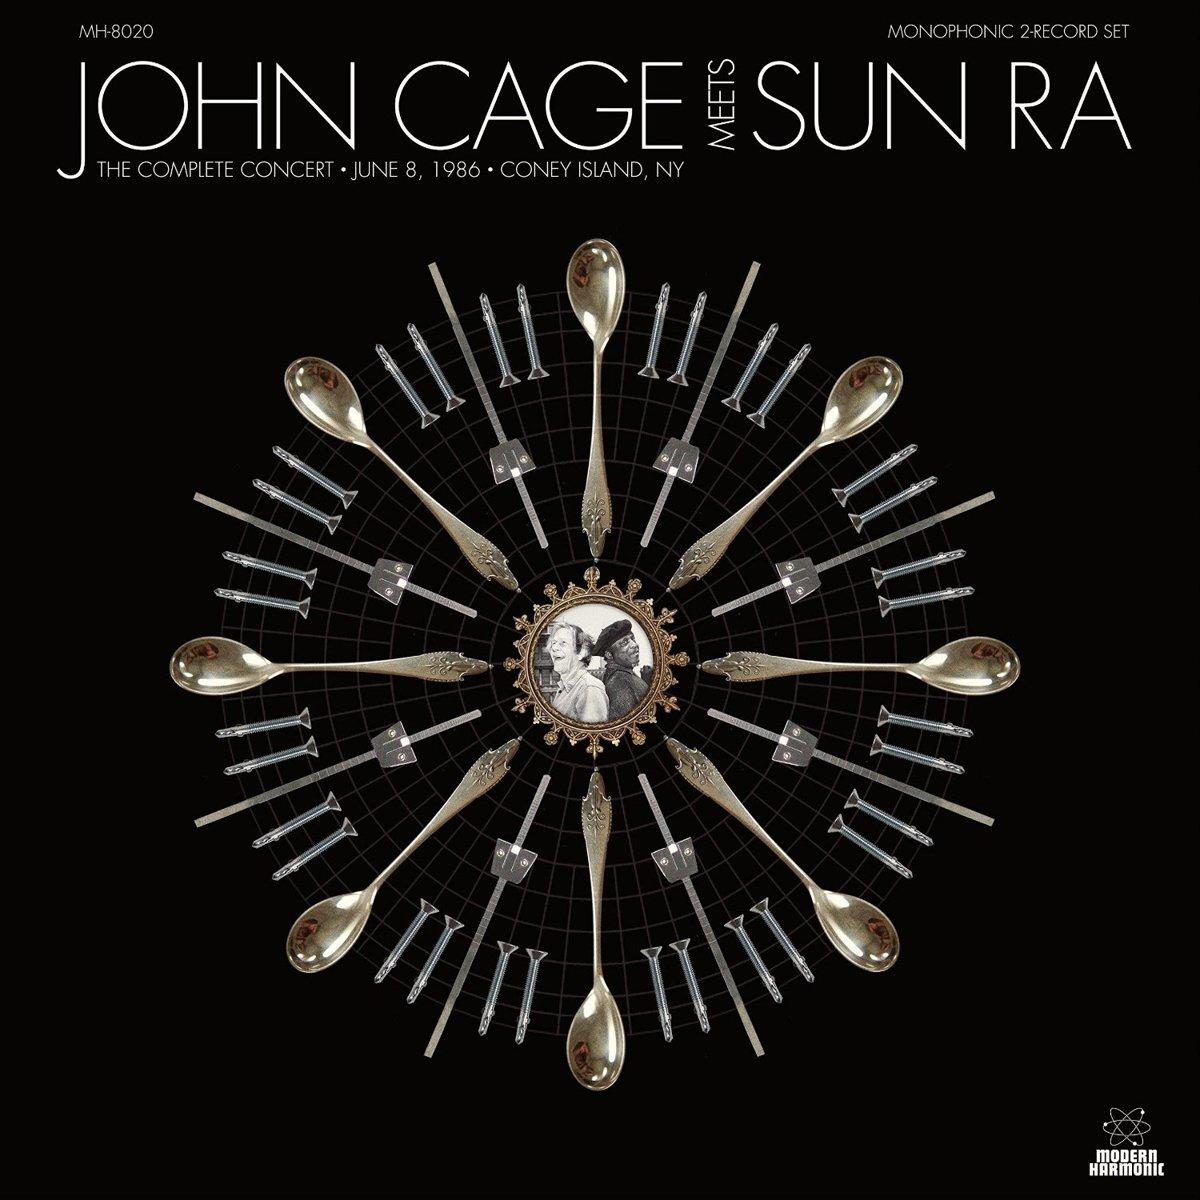 Vinilo : John Cage - Complete Performance (Gatefold LP Jacket, 2PC)